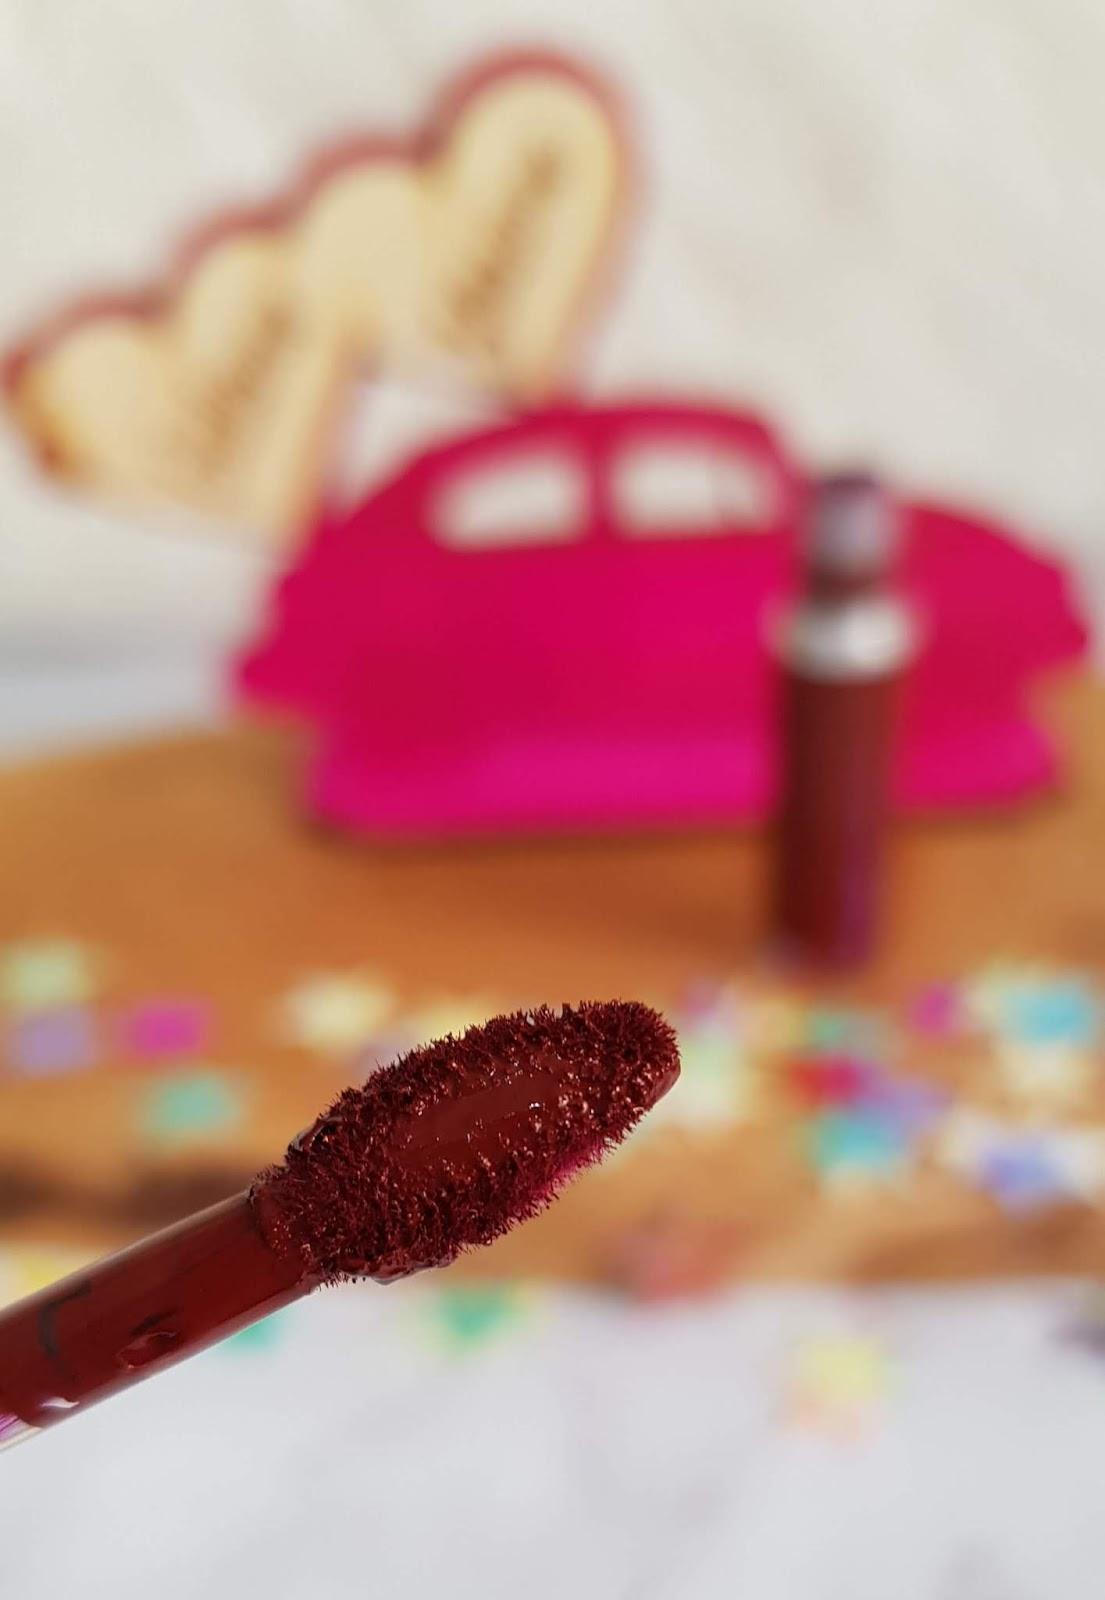 Mac Cosmetics Retro Matte Likit Ruj Gülümse Yüzüme Makyaj Blogu